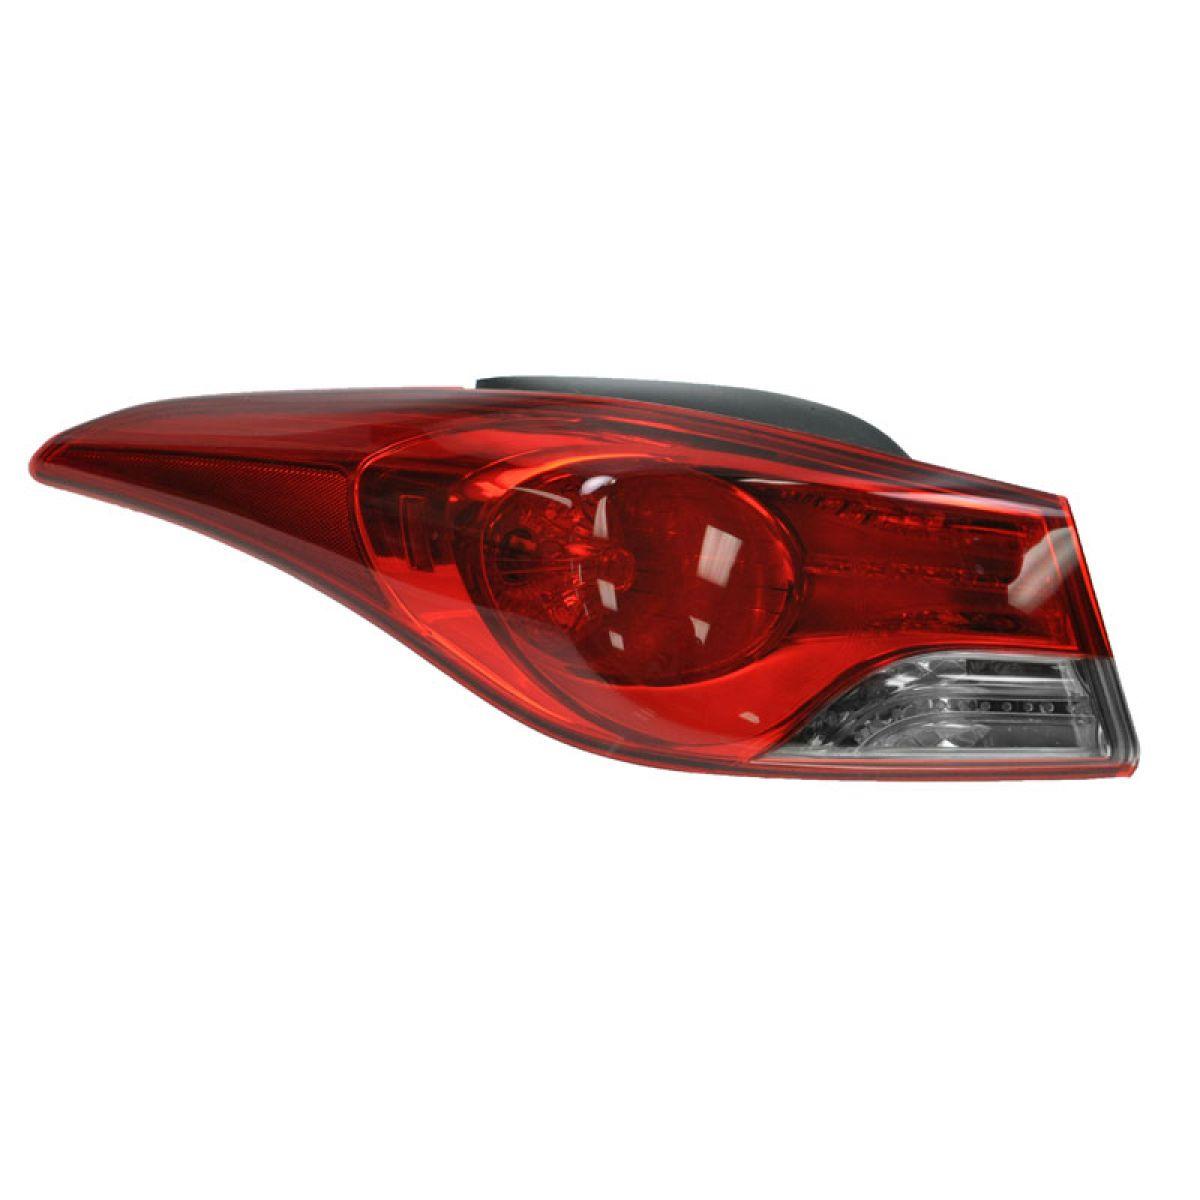 Taillight Outer Brake Light Driver Side Left LH for 11-13 Elantra Sedan US Built